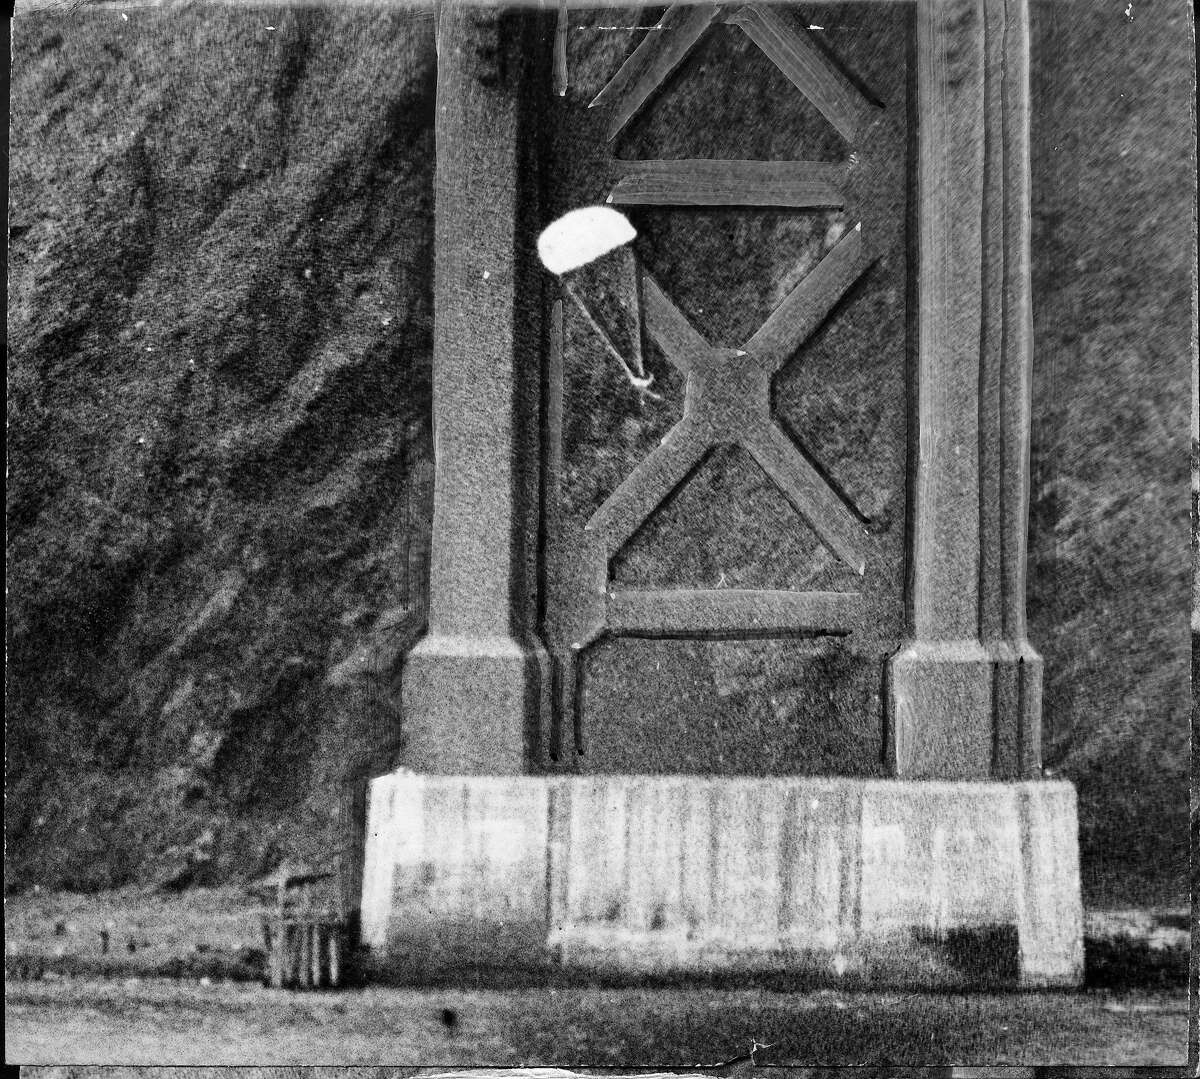 Chronicle Photographer Bob Campbell followed Parachutist Robert Niles successful 2nd attempt to parachute off the Golden Gate Bridge in 10 photos, April 15, 1949 Photo ran April 16, 1949, P. 1